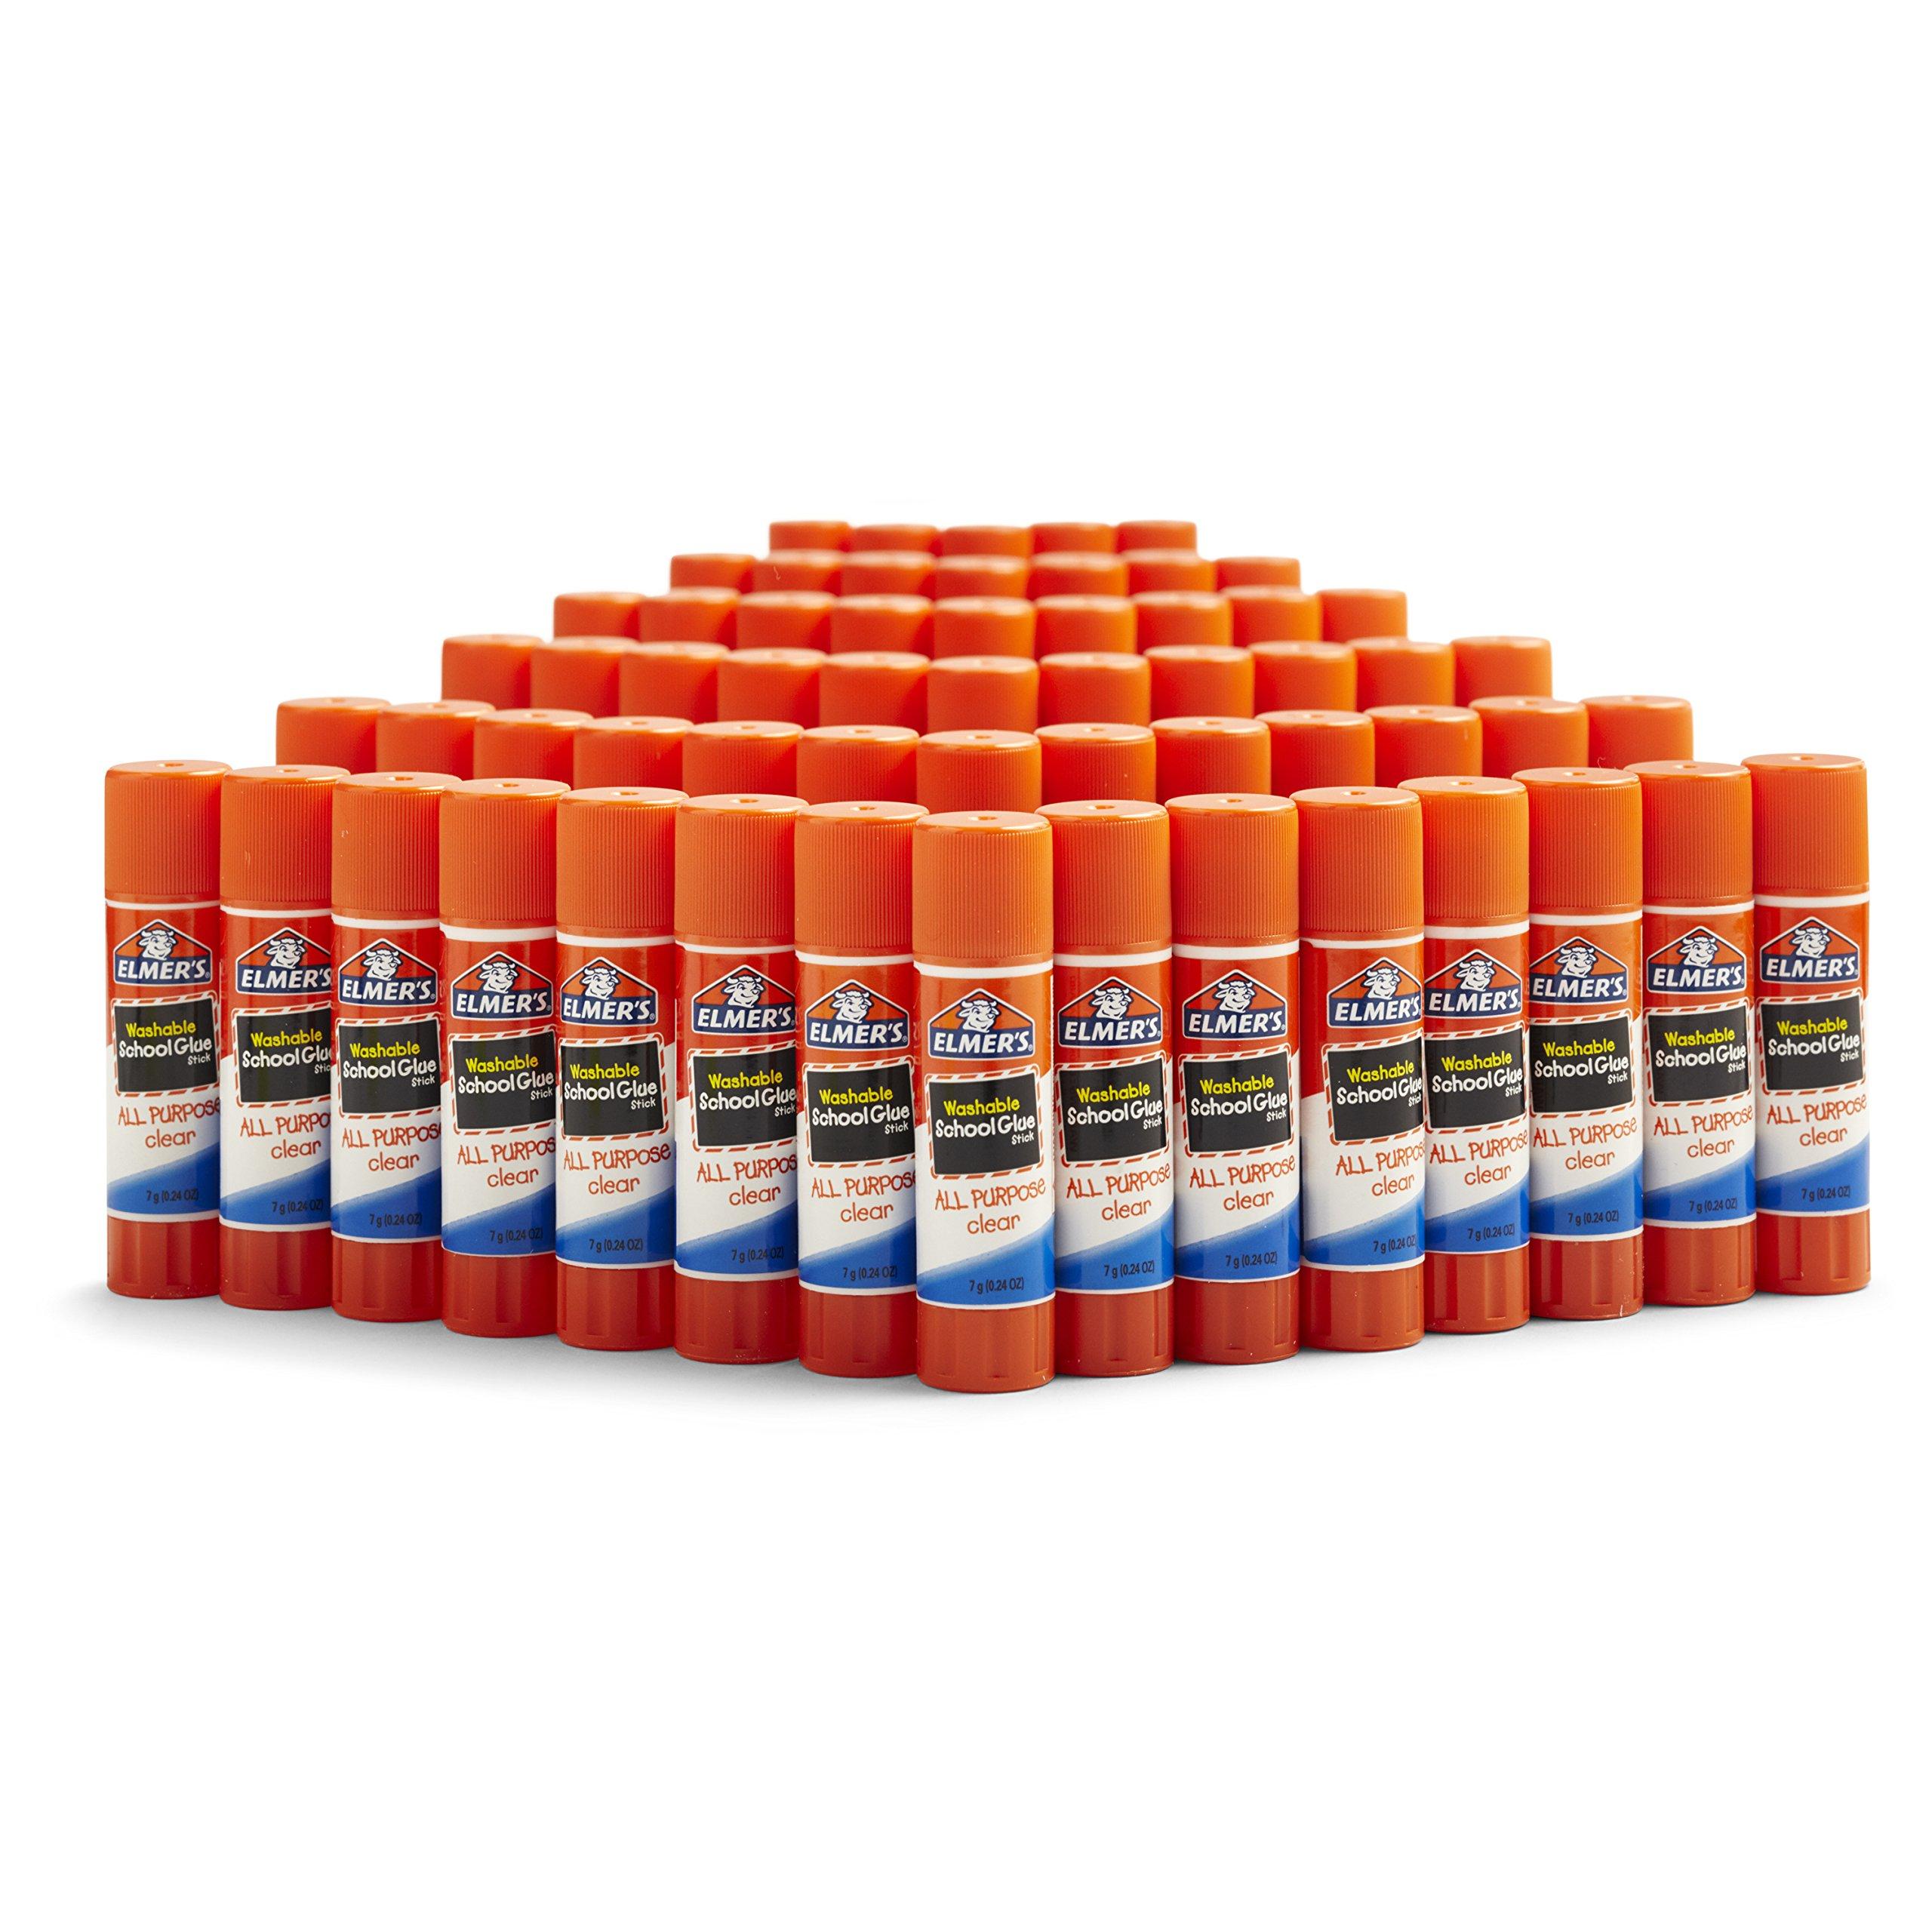 Elmer's All Purpose School Glue Sticks, Washable, 60 Pack, 0.24-ounce sticks by Elmer's (Image #1)